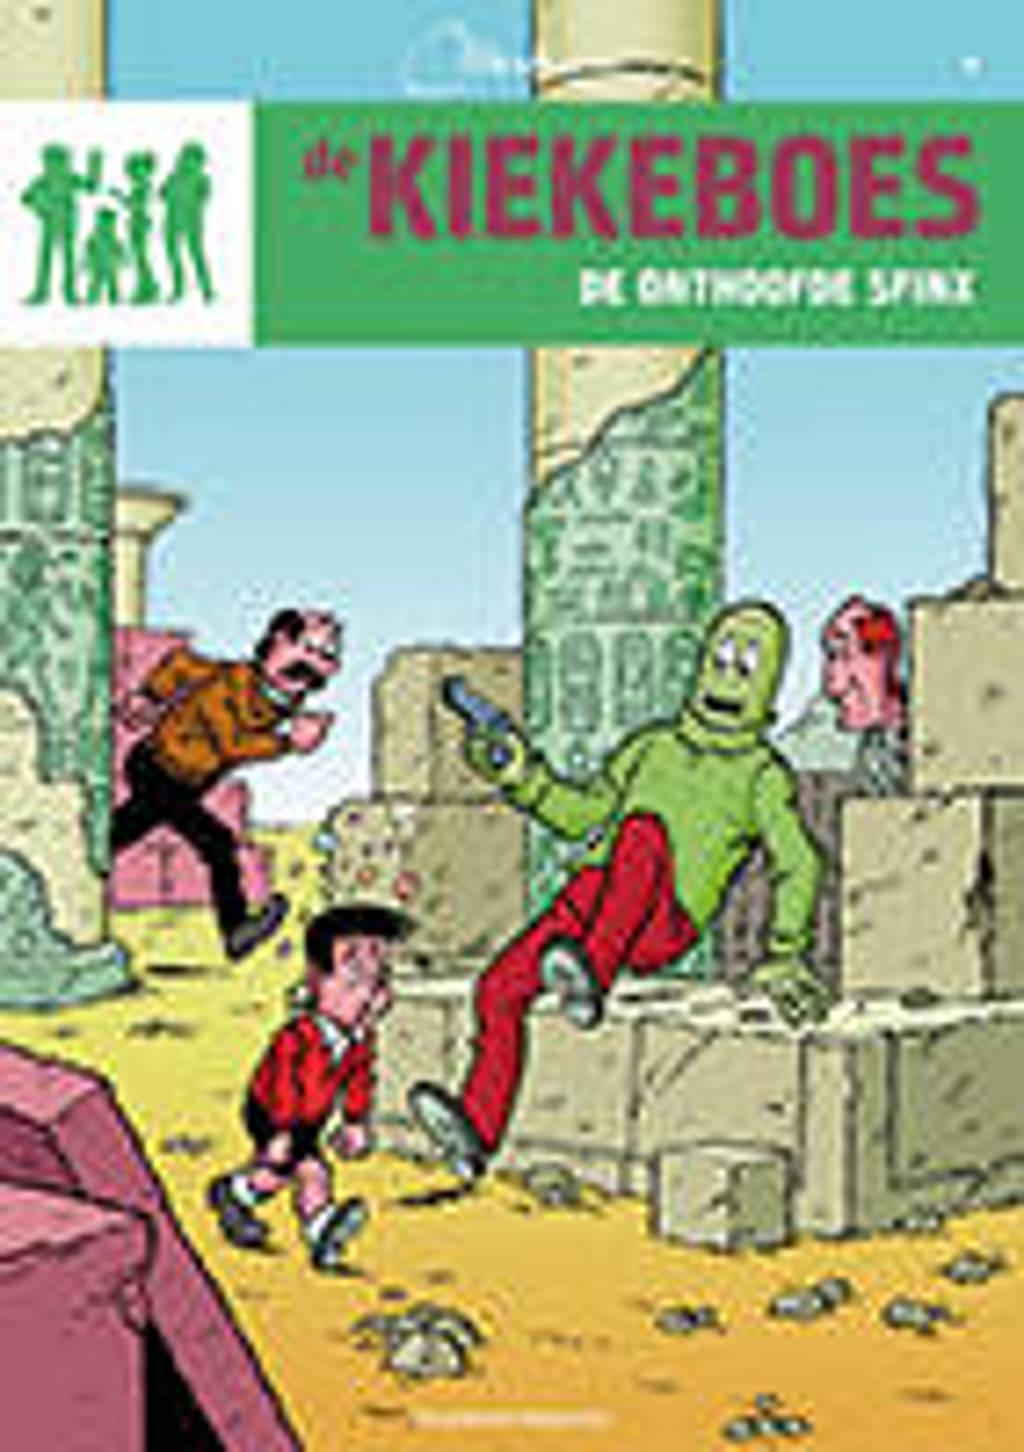 De Kiekeboes: De onthoofde Sfinx - Merho